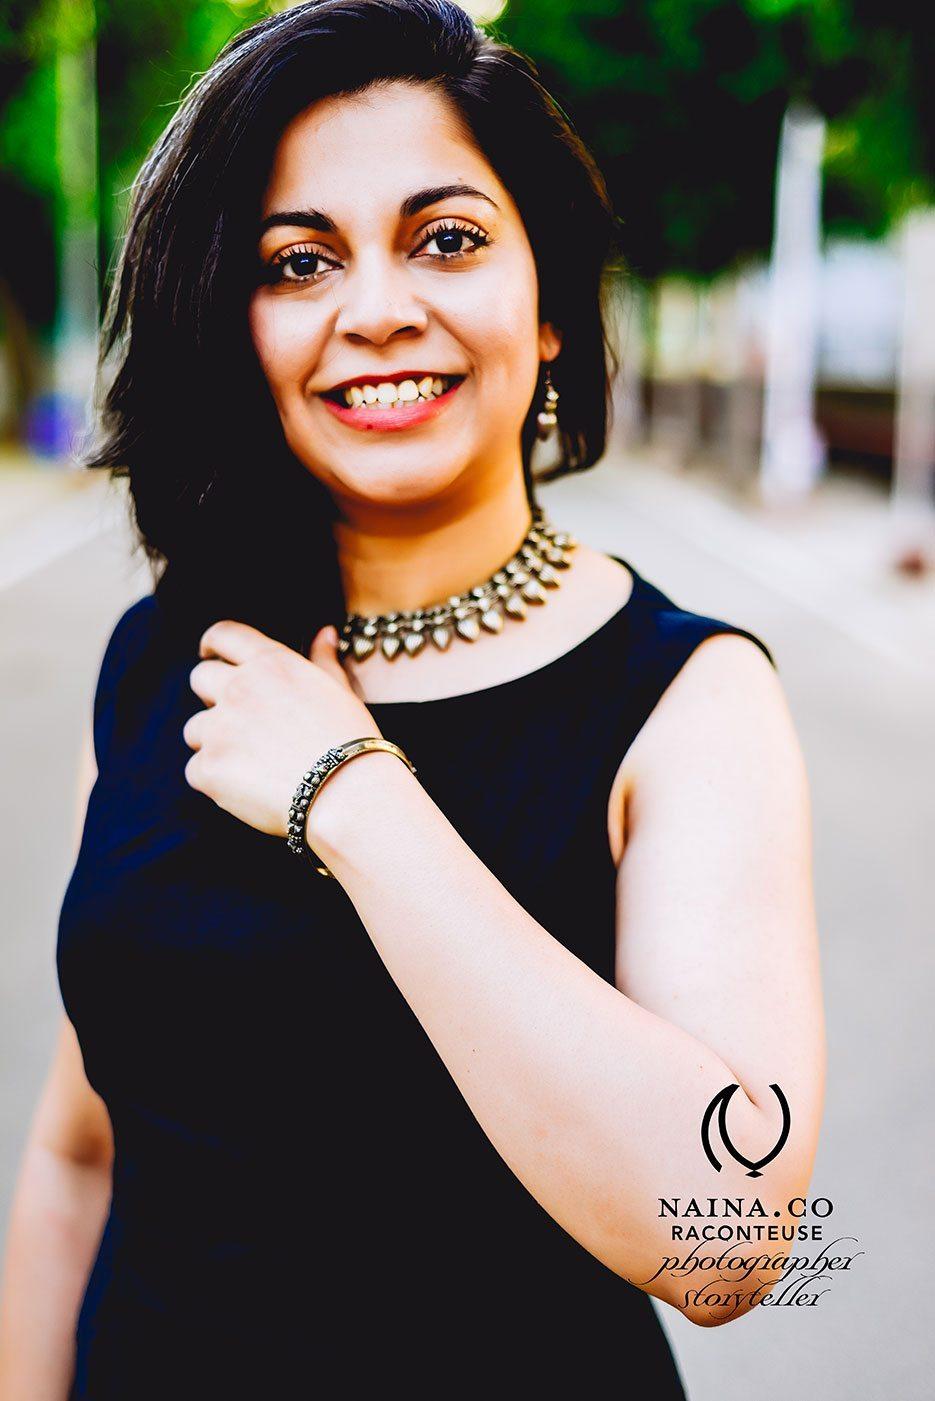 Fiama-Naina-Akanksha-WIFWAW14-CoverUp-13-Raconteuse-Storyteller-Photographer-Naina.co